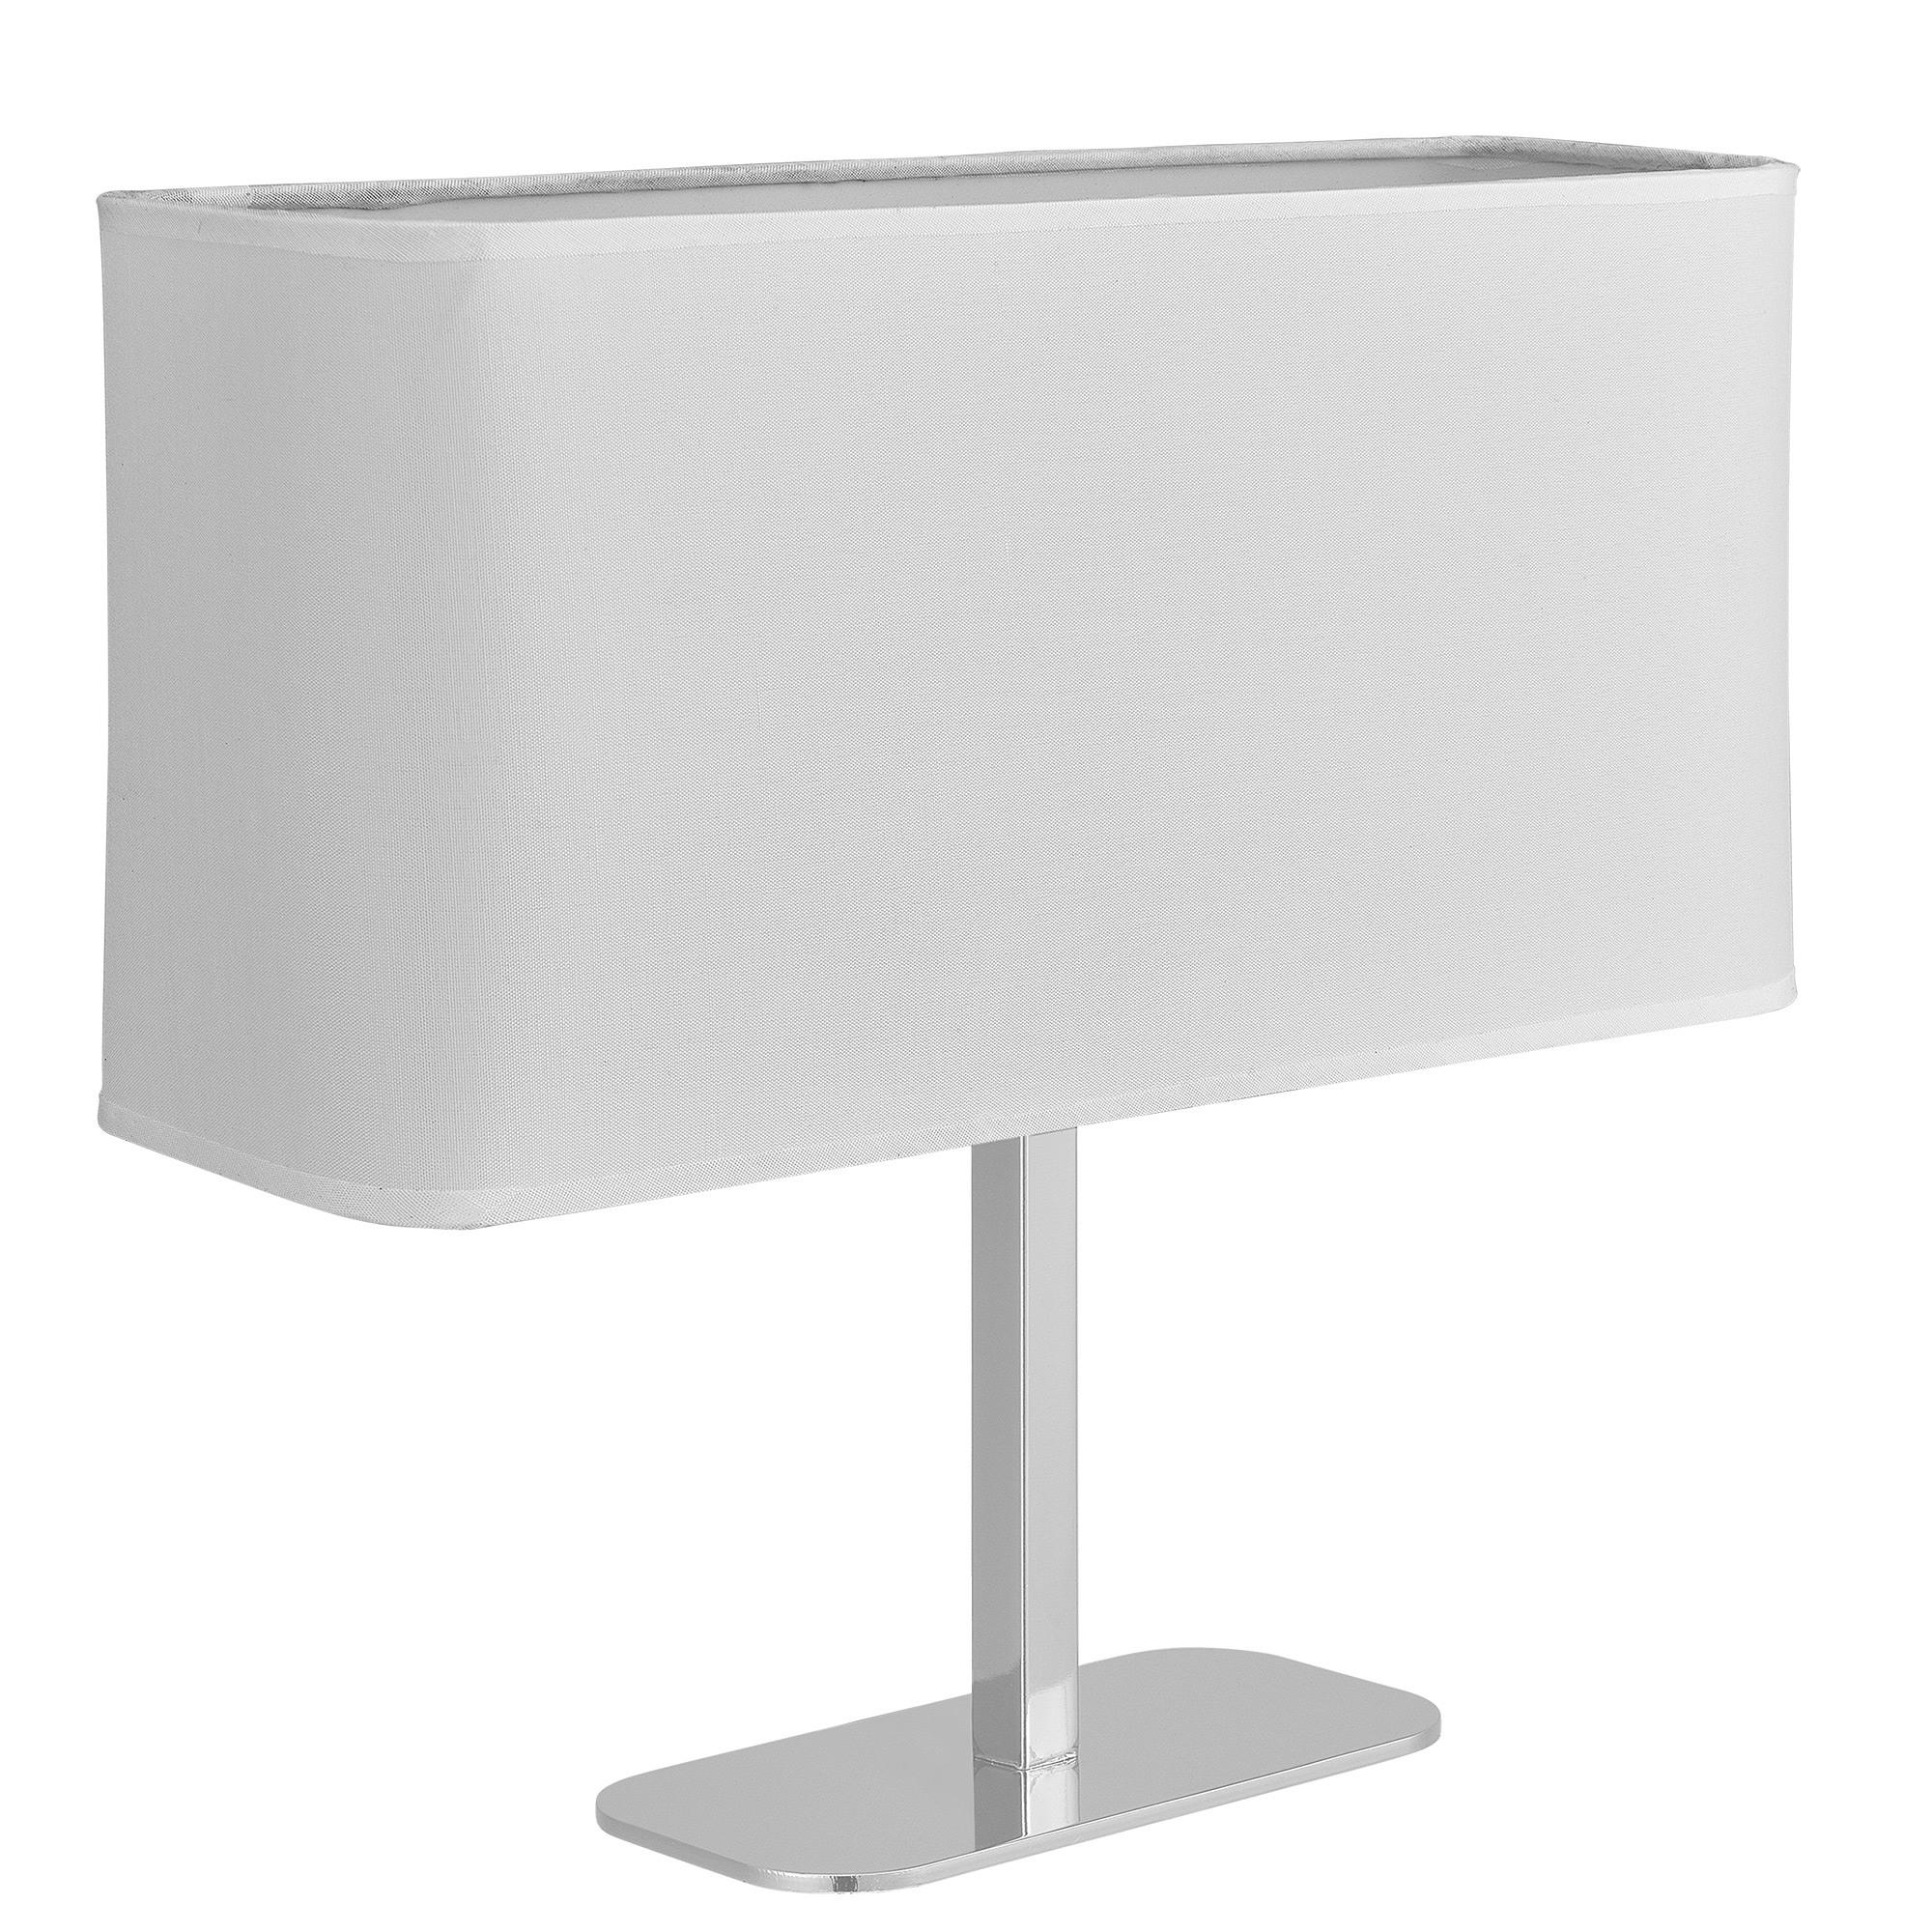 nostalgische bankerlampe schreibtischlampe bibliothekslampe tischlampe gr n ebay. Black Bedroom Furniture Sets. Home Design Ideas